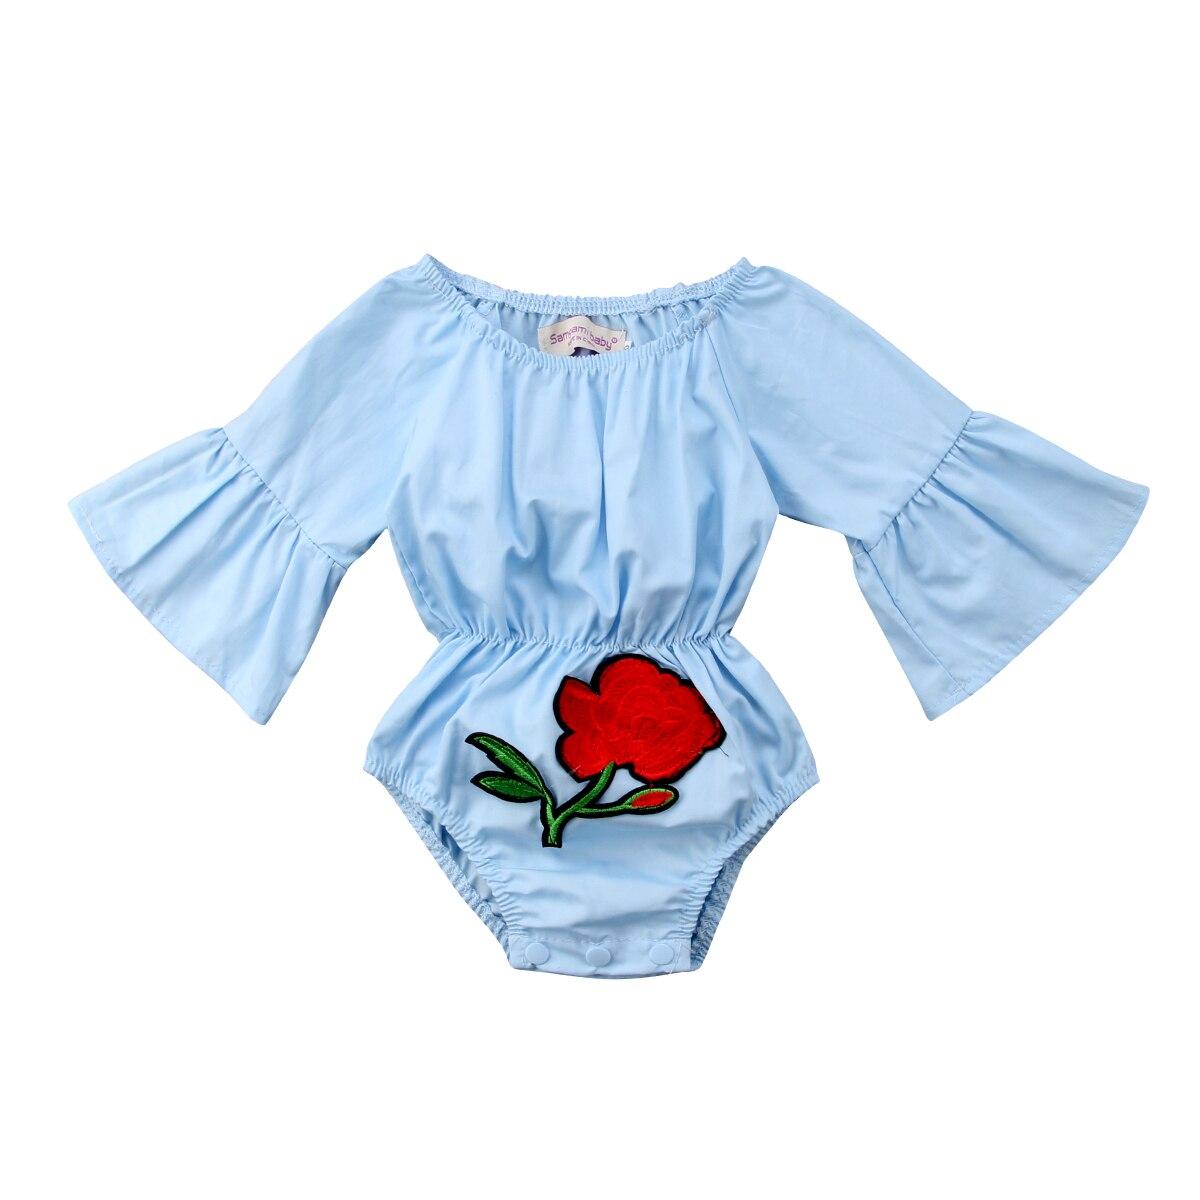 0-24 M Pasgeboren Kids Baby Meisjes Leuke Bloemen Lange Mouwen Romper Lente Zomer Blauw Jumpsuit Sunsuit Outfits Baby Meisjes Kleding Klanten Eerst